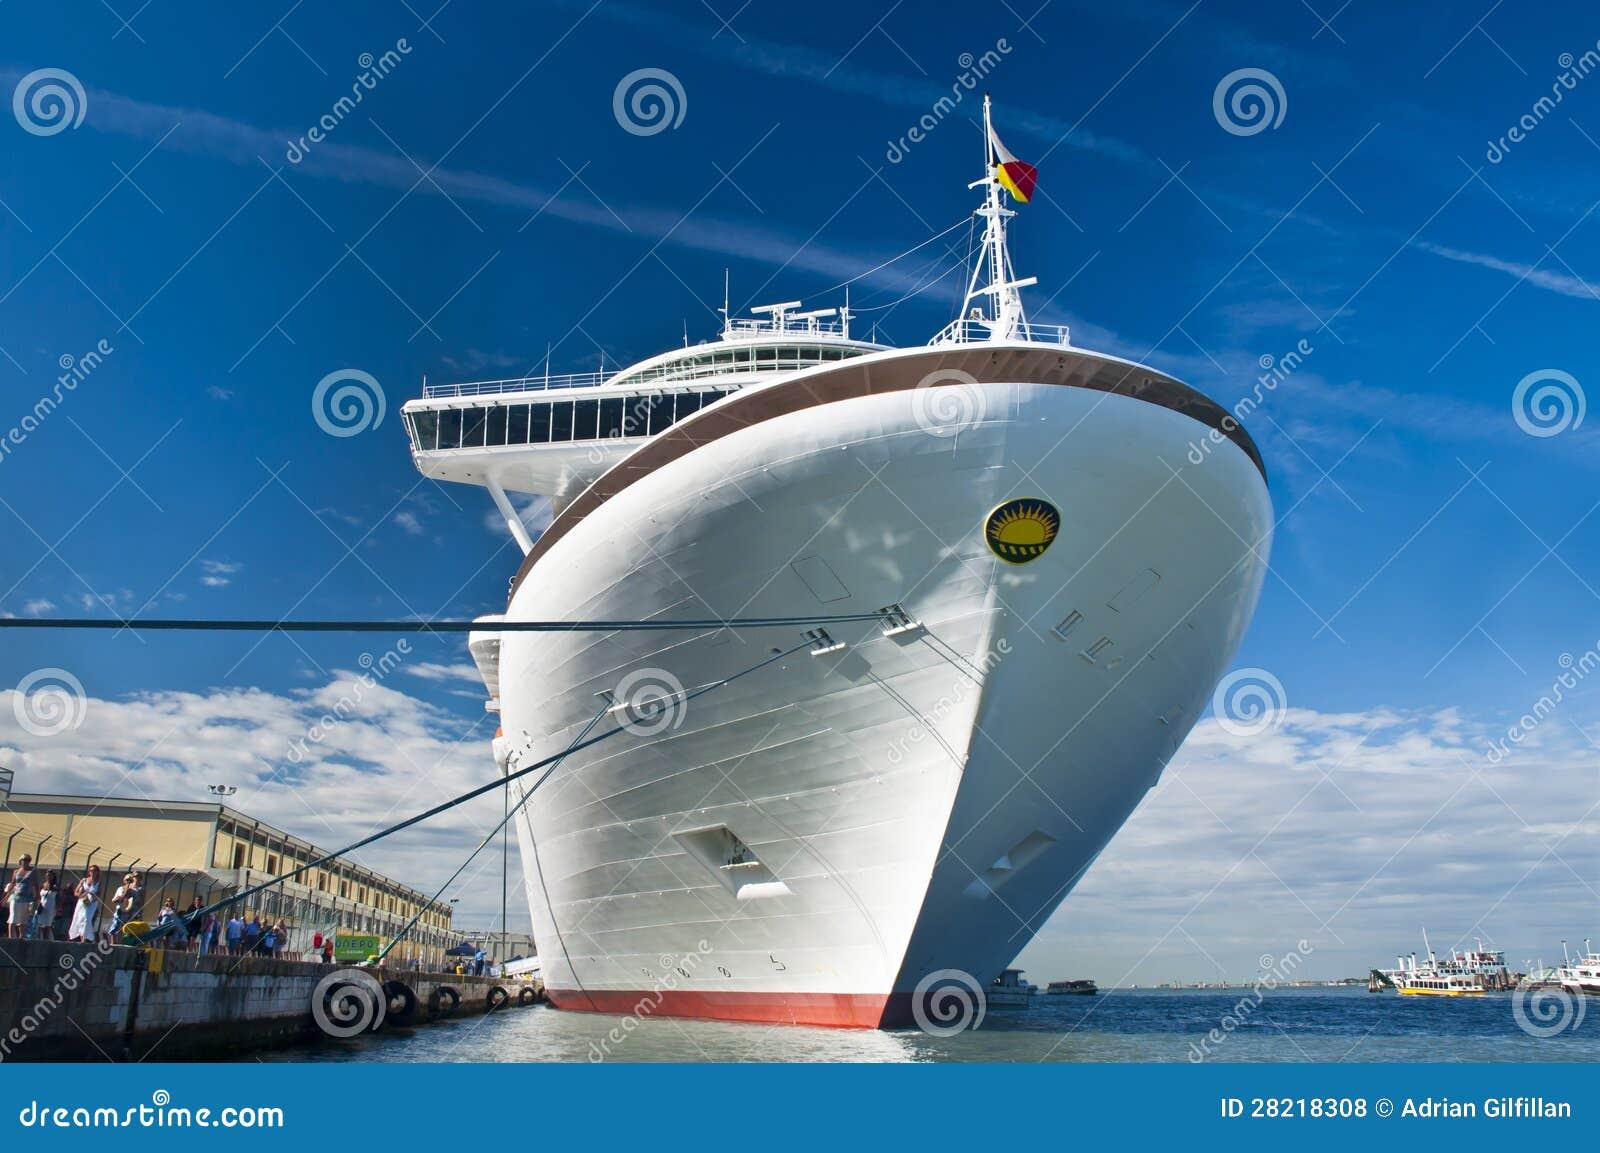 how to avoid norovirus on cruise ships